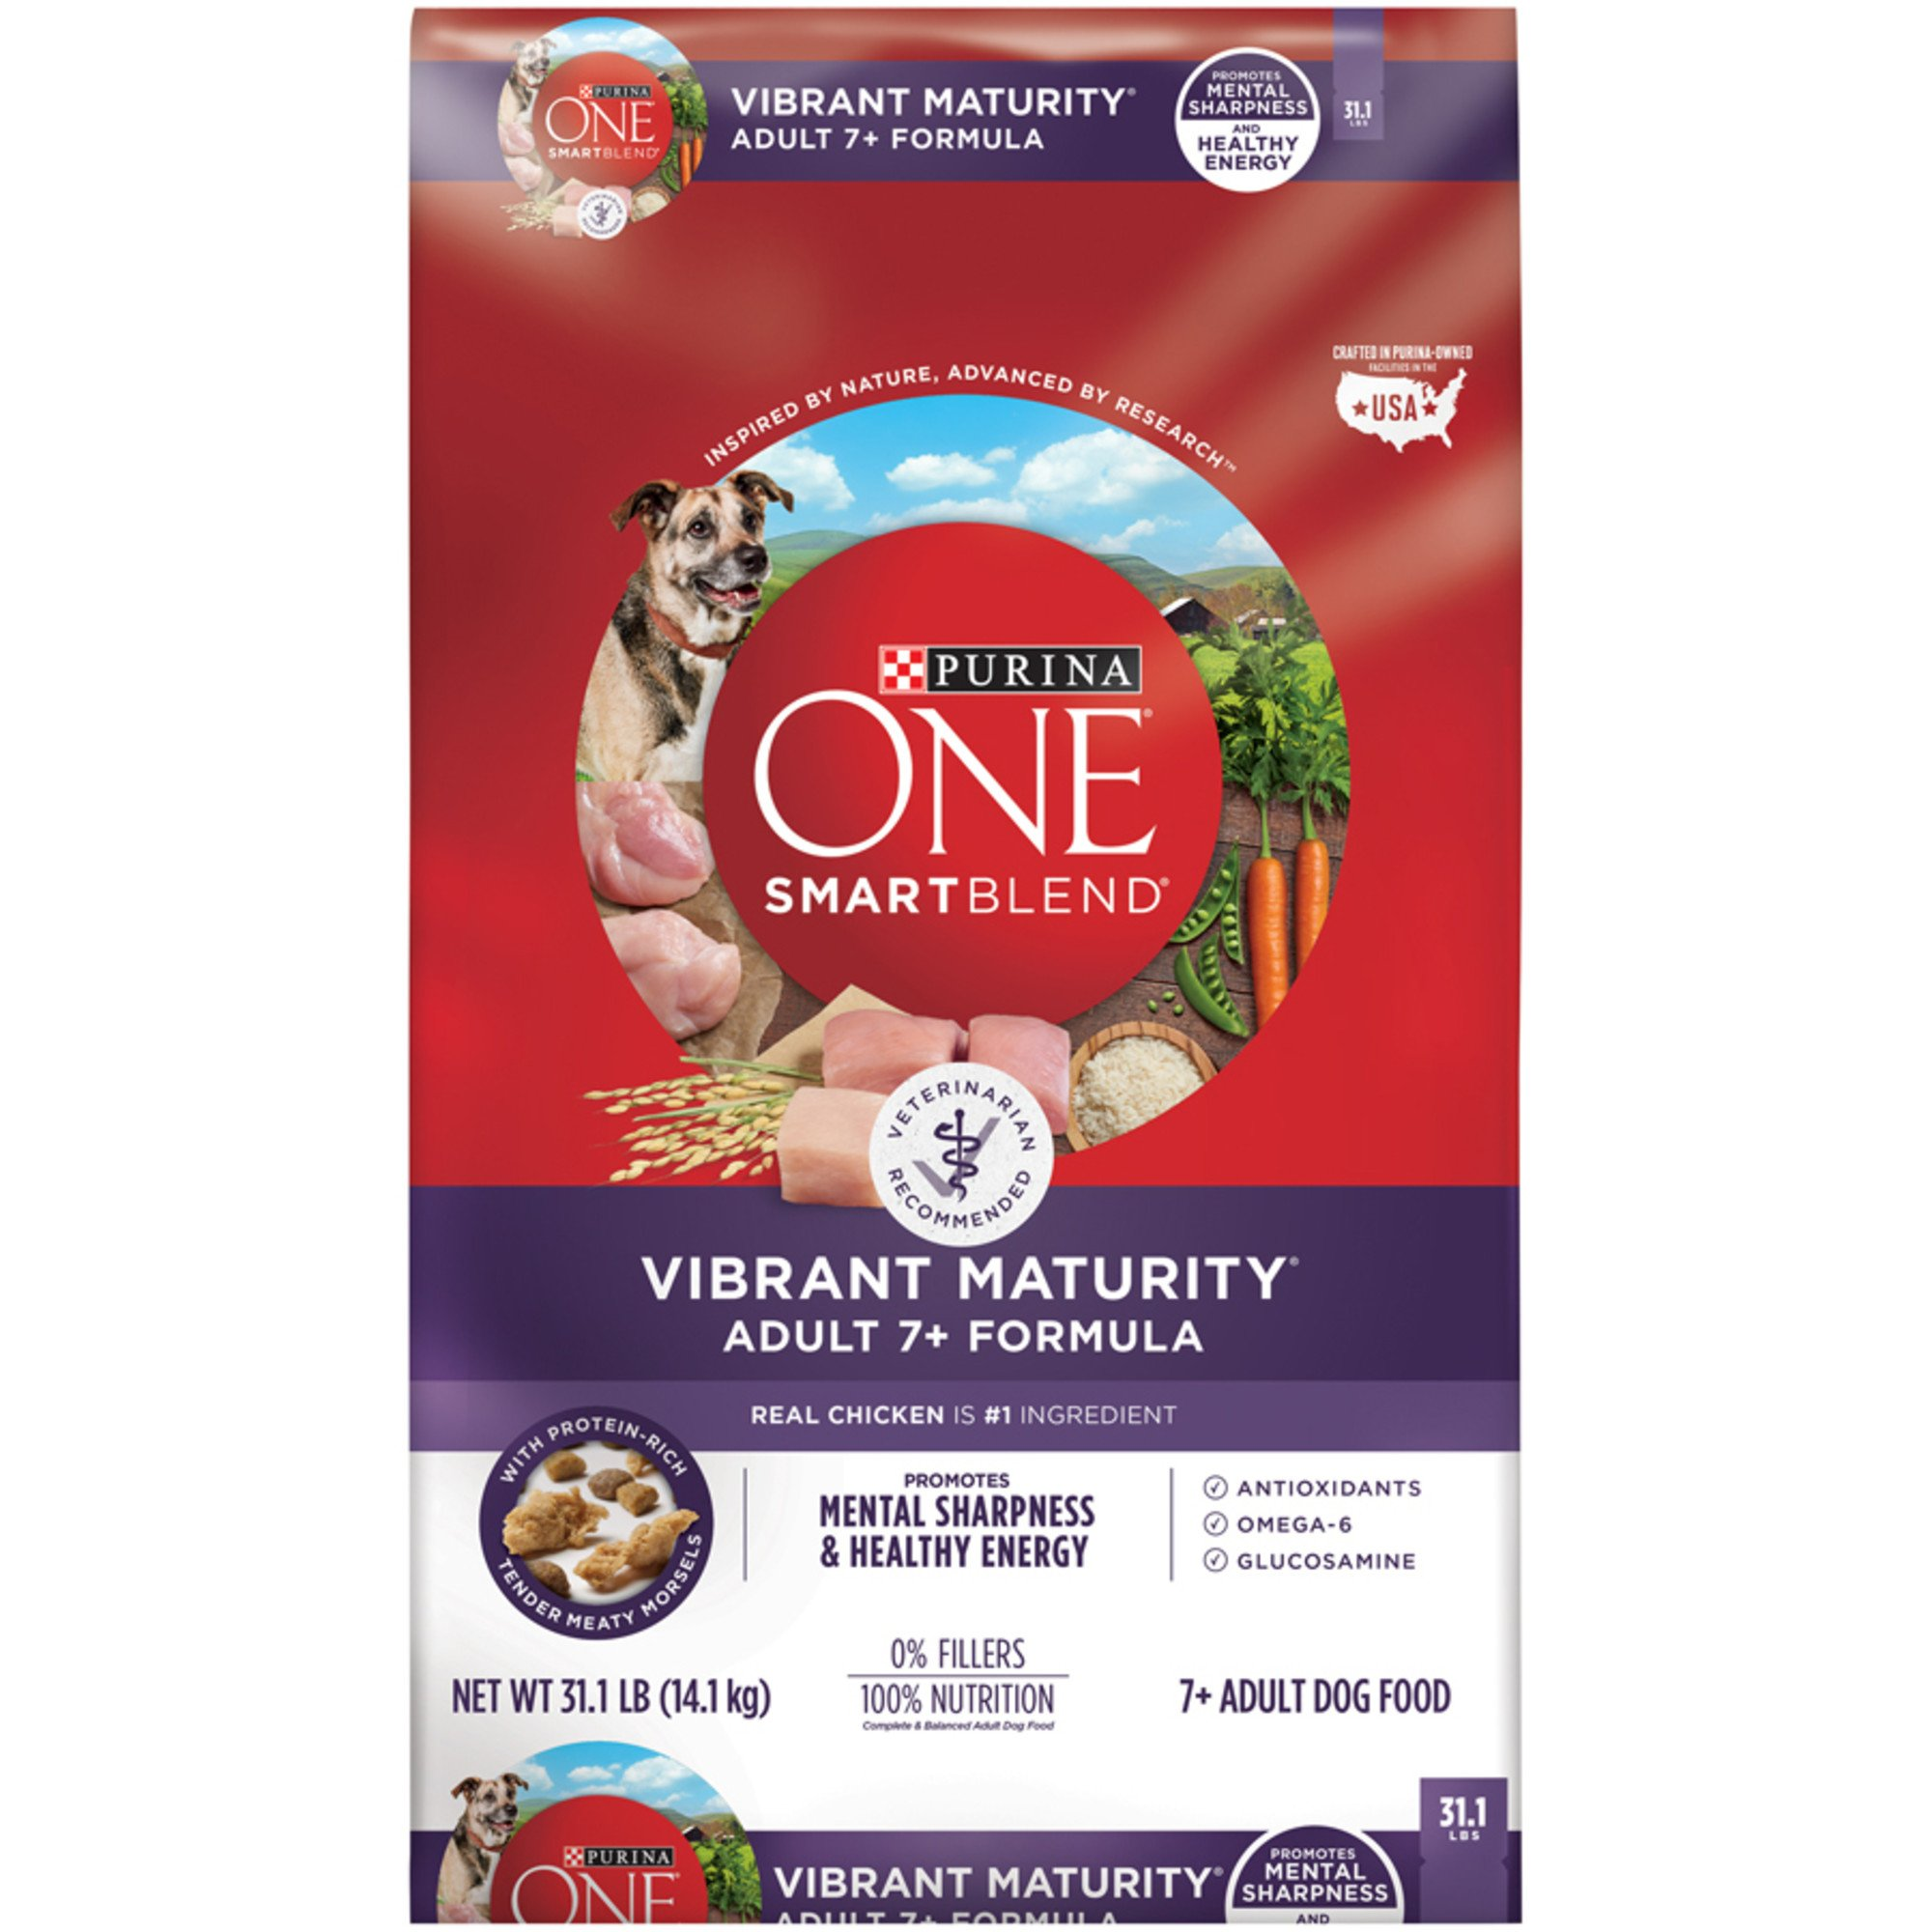 Purina ONE Smartblend Vibrant Maturity 7+ Senior Formula Dog Food